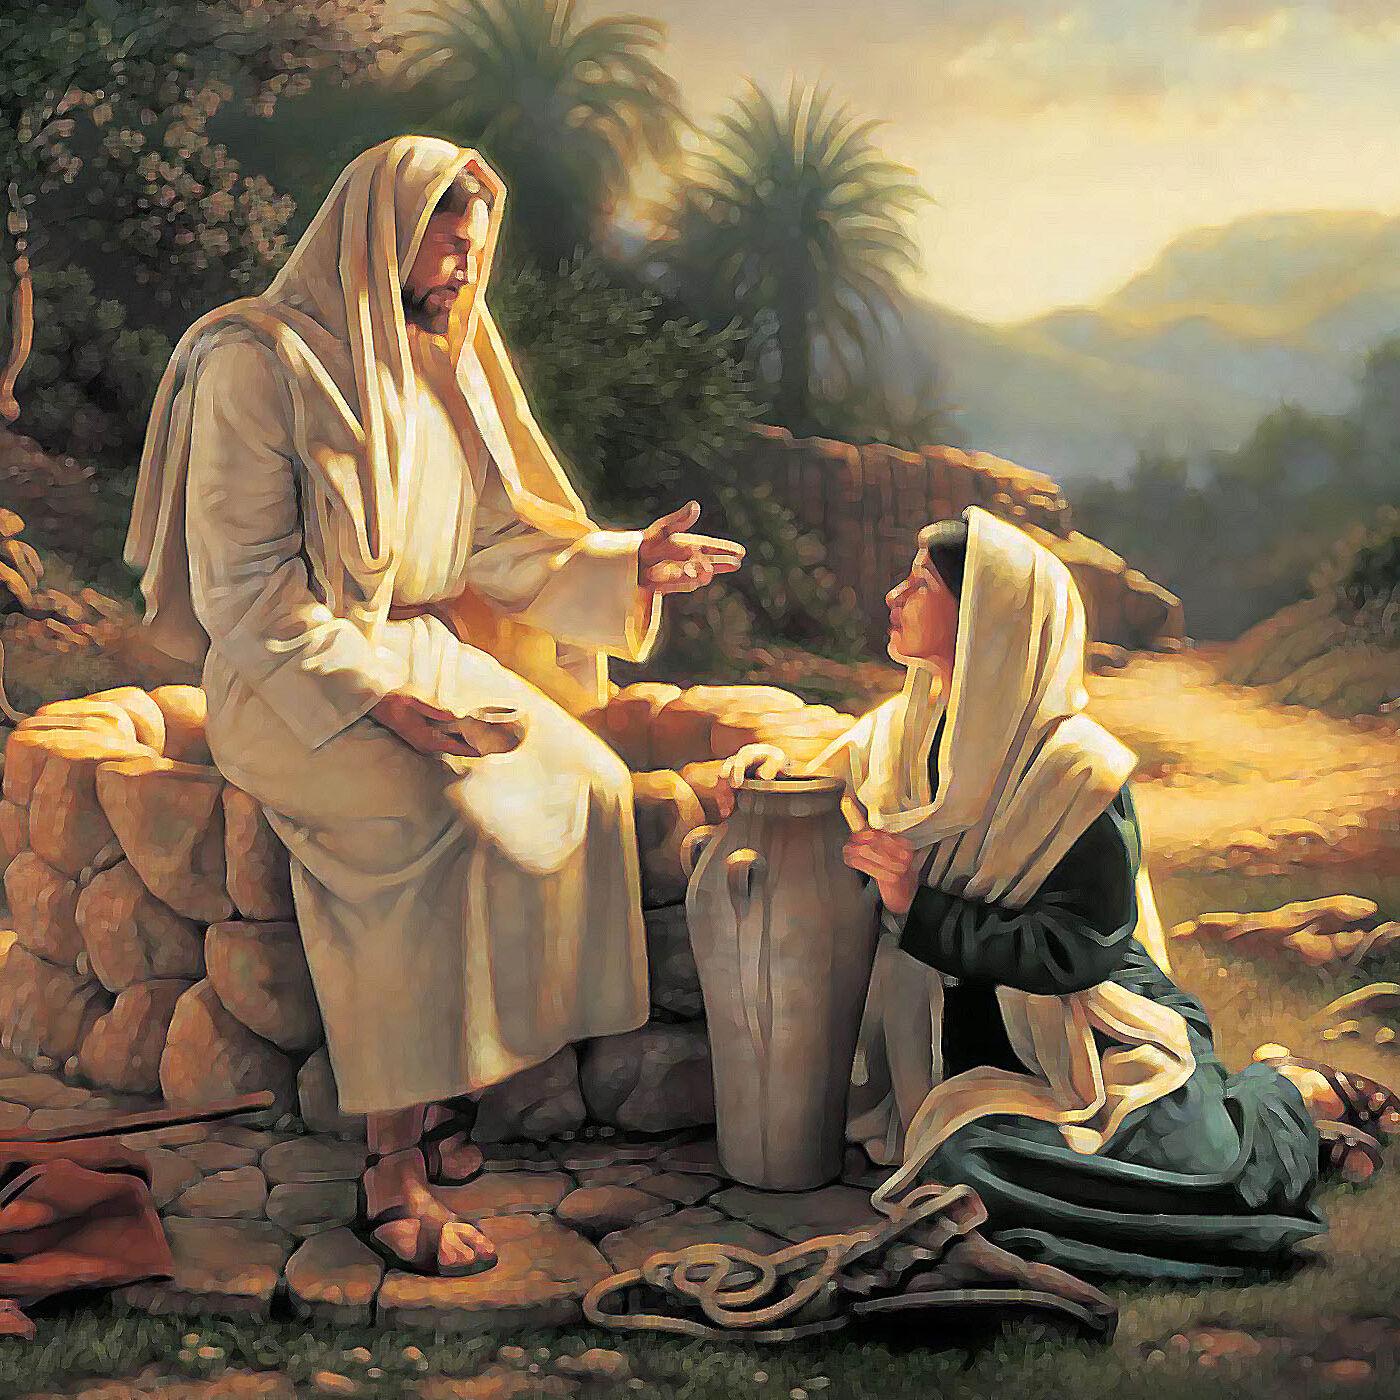 riflessioni sul Vangelo di Venerdì 26 Febbraio 2021 (Mt 5, 20-26)